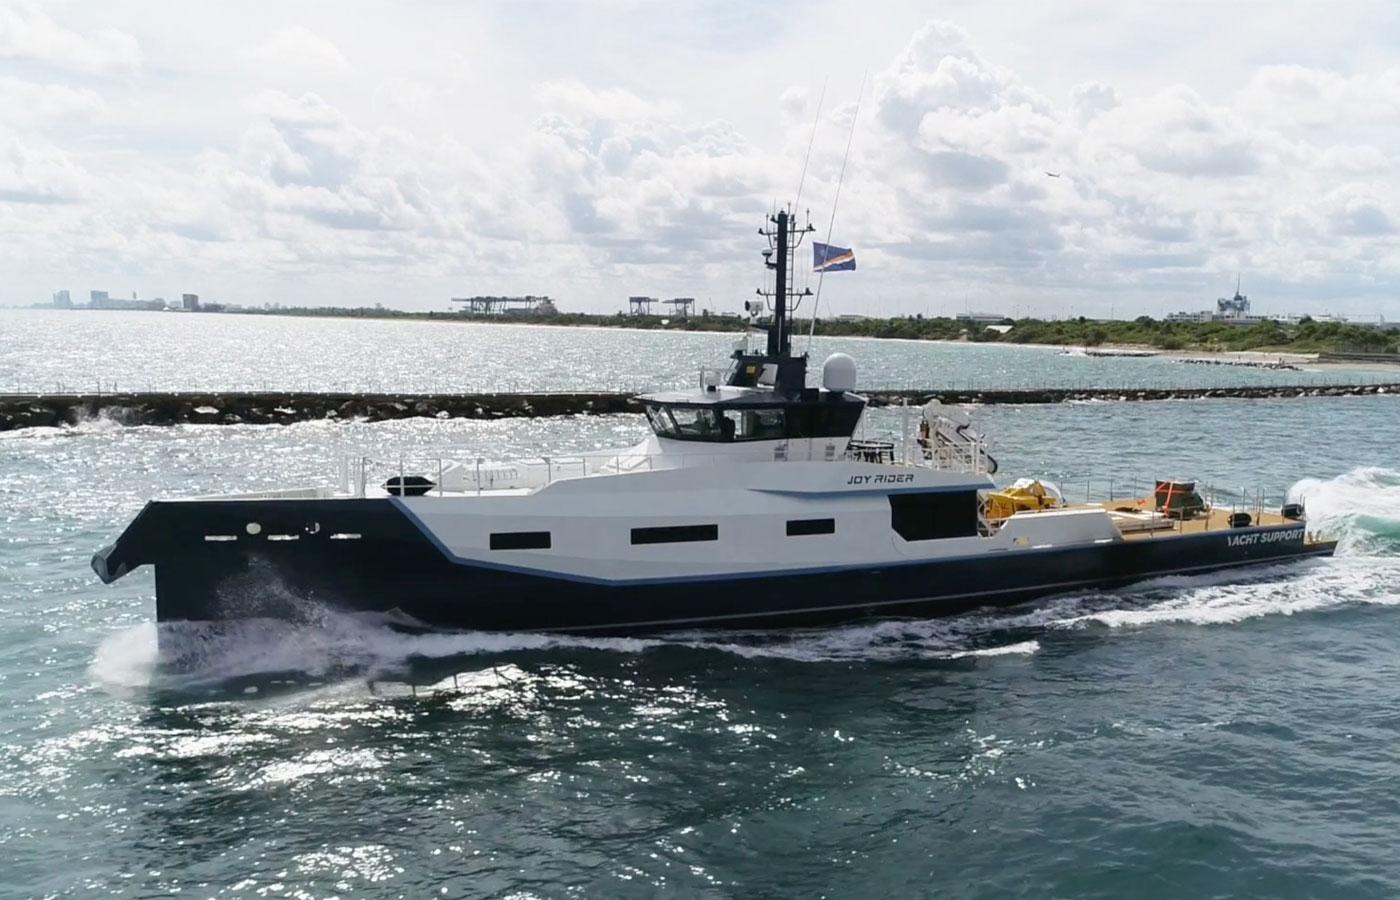 JOY RIDER Damen Sea Axe Support Vessel [Yacht Review]